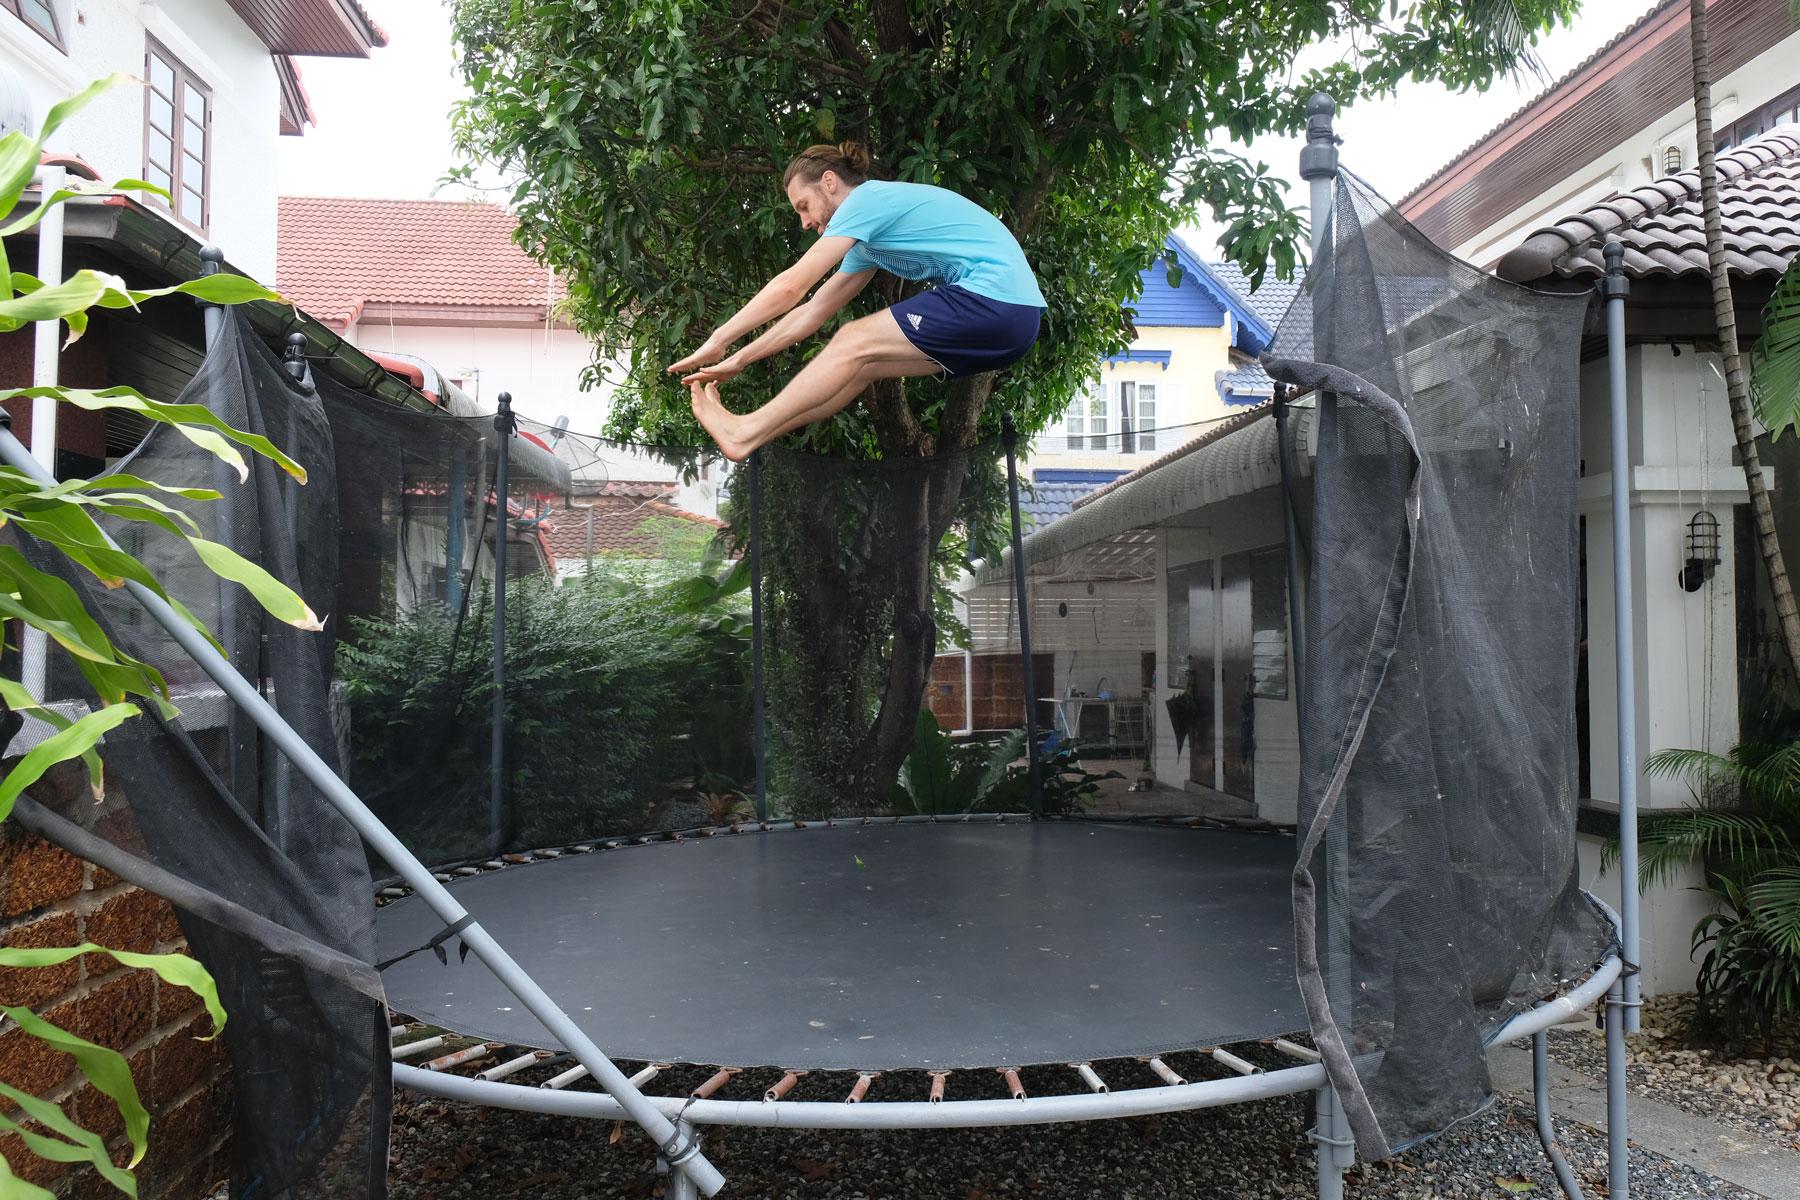 Sebastian hüpft auf dem großen Trampolin im Garten unseres Hauses in Bangkok